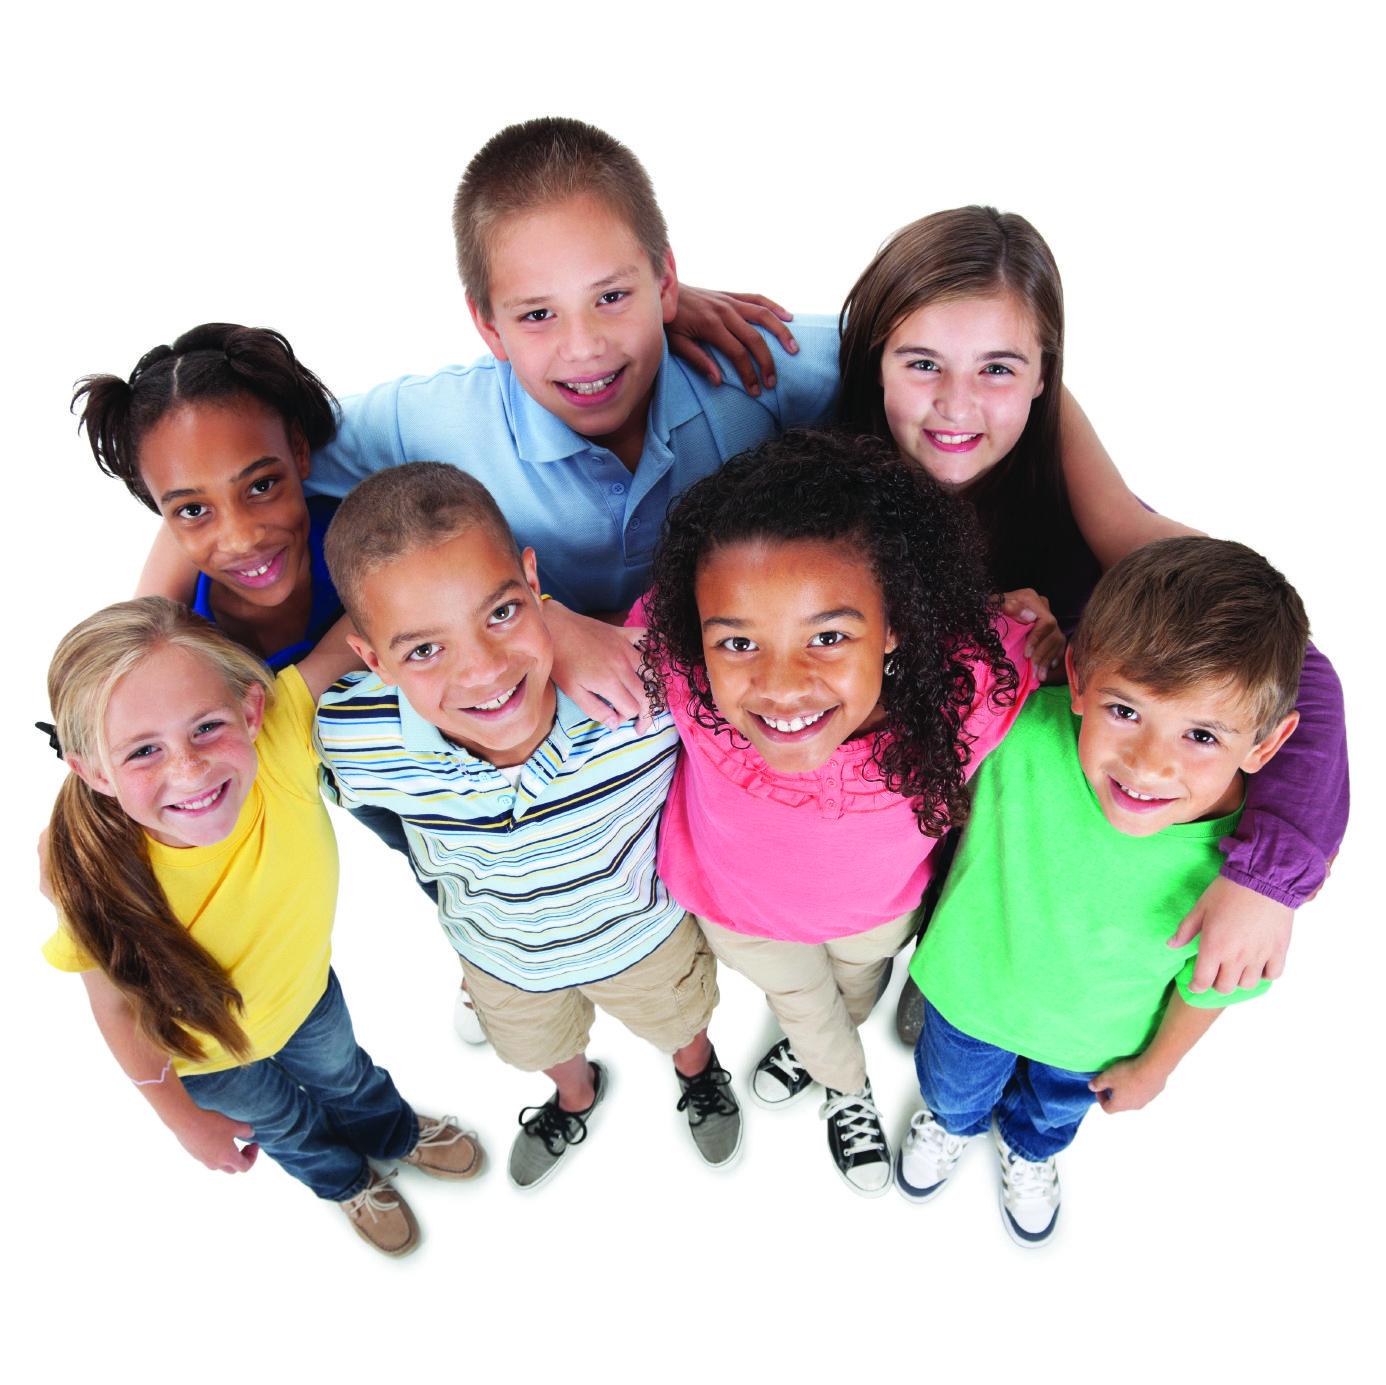 Happy Children Instructional leadership, Kids behavior